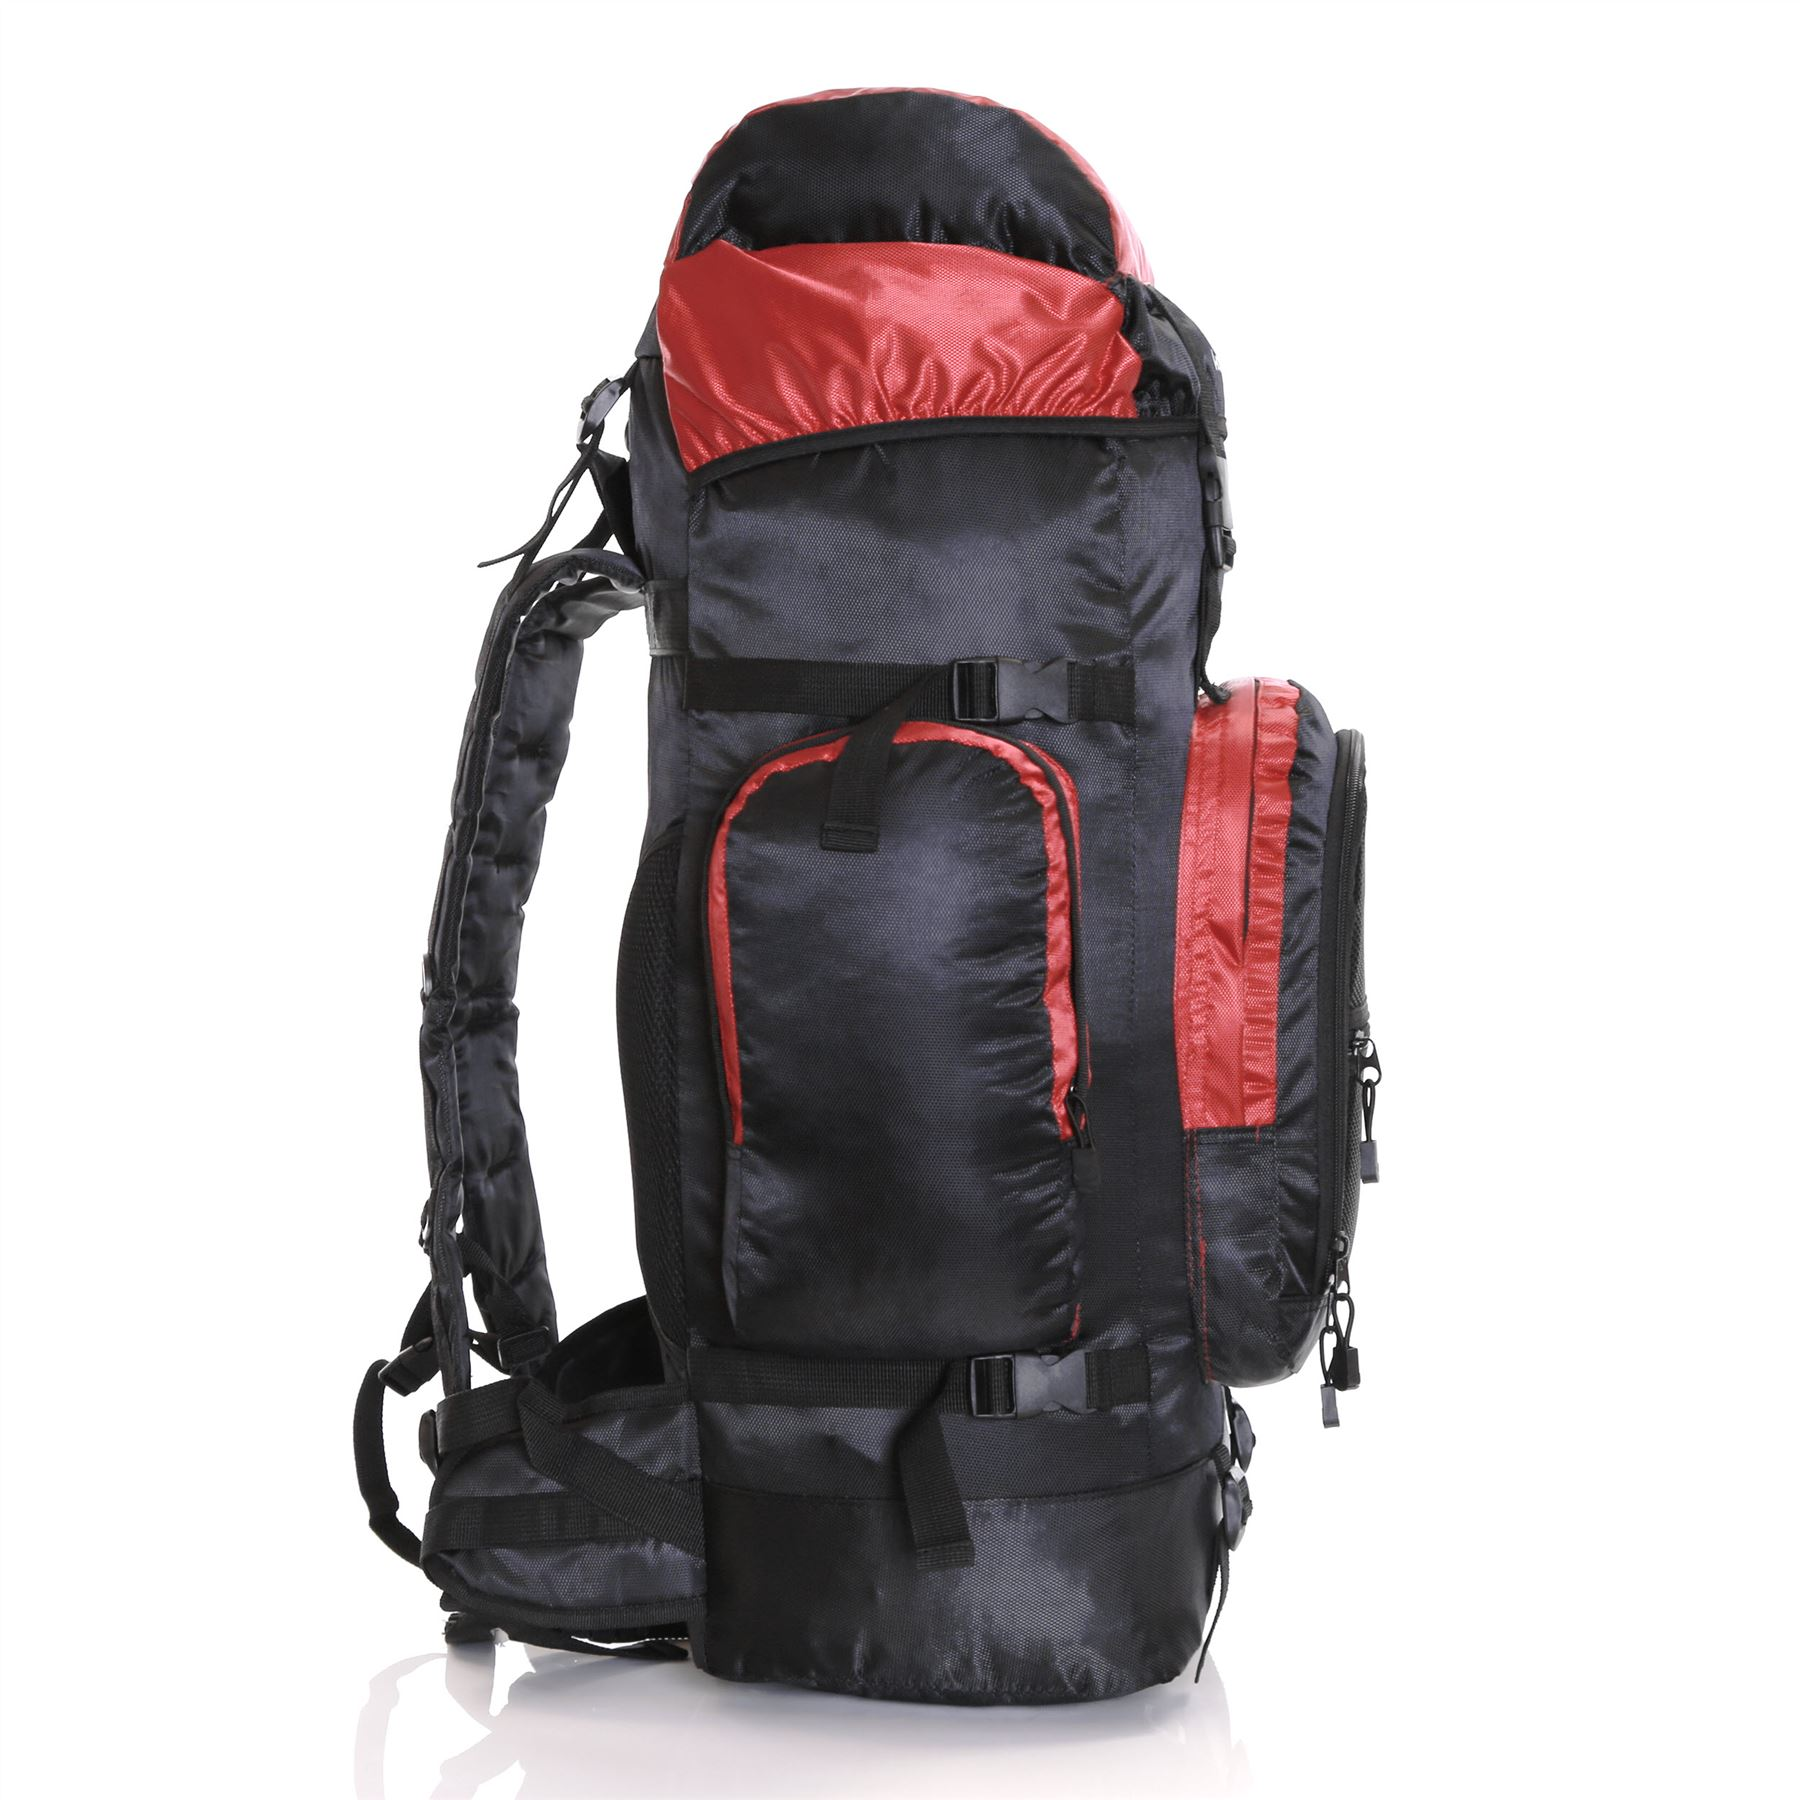 sac de randonnee grande contenance 80l trekking balade montagne camping ebay. Black Bedroom Furniture Sets. Home Design Ideas